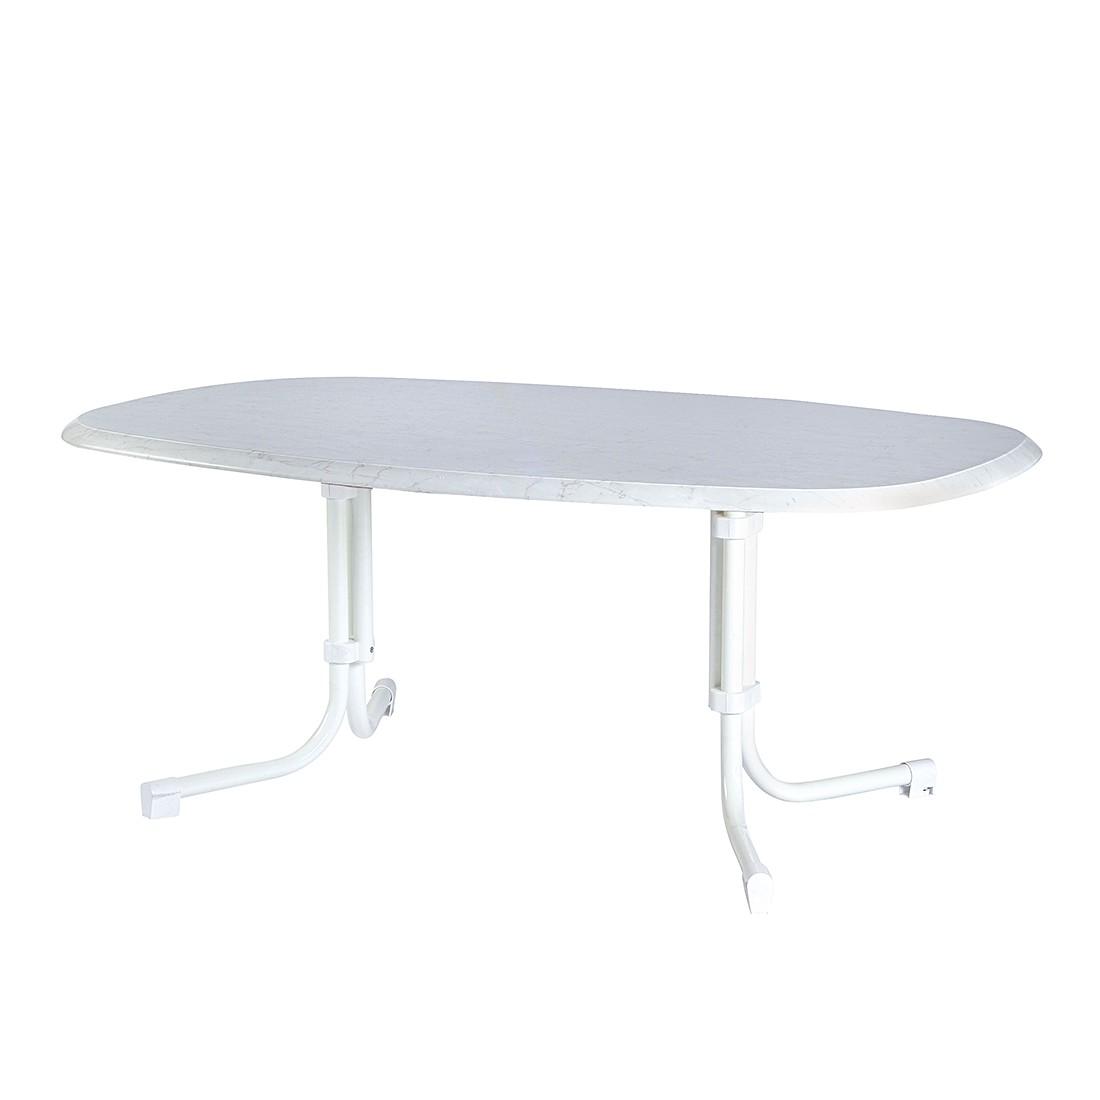 gartentisch klappbar oval. Black Bedroom Furniture Sets. Home Design Ideas